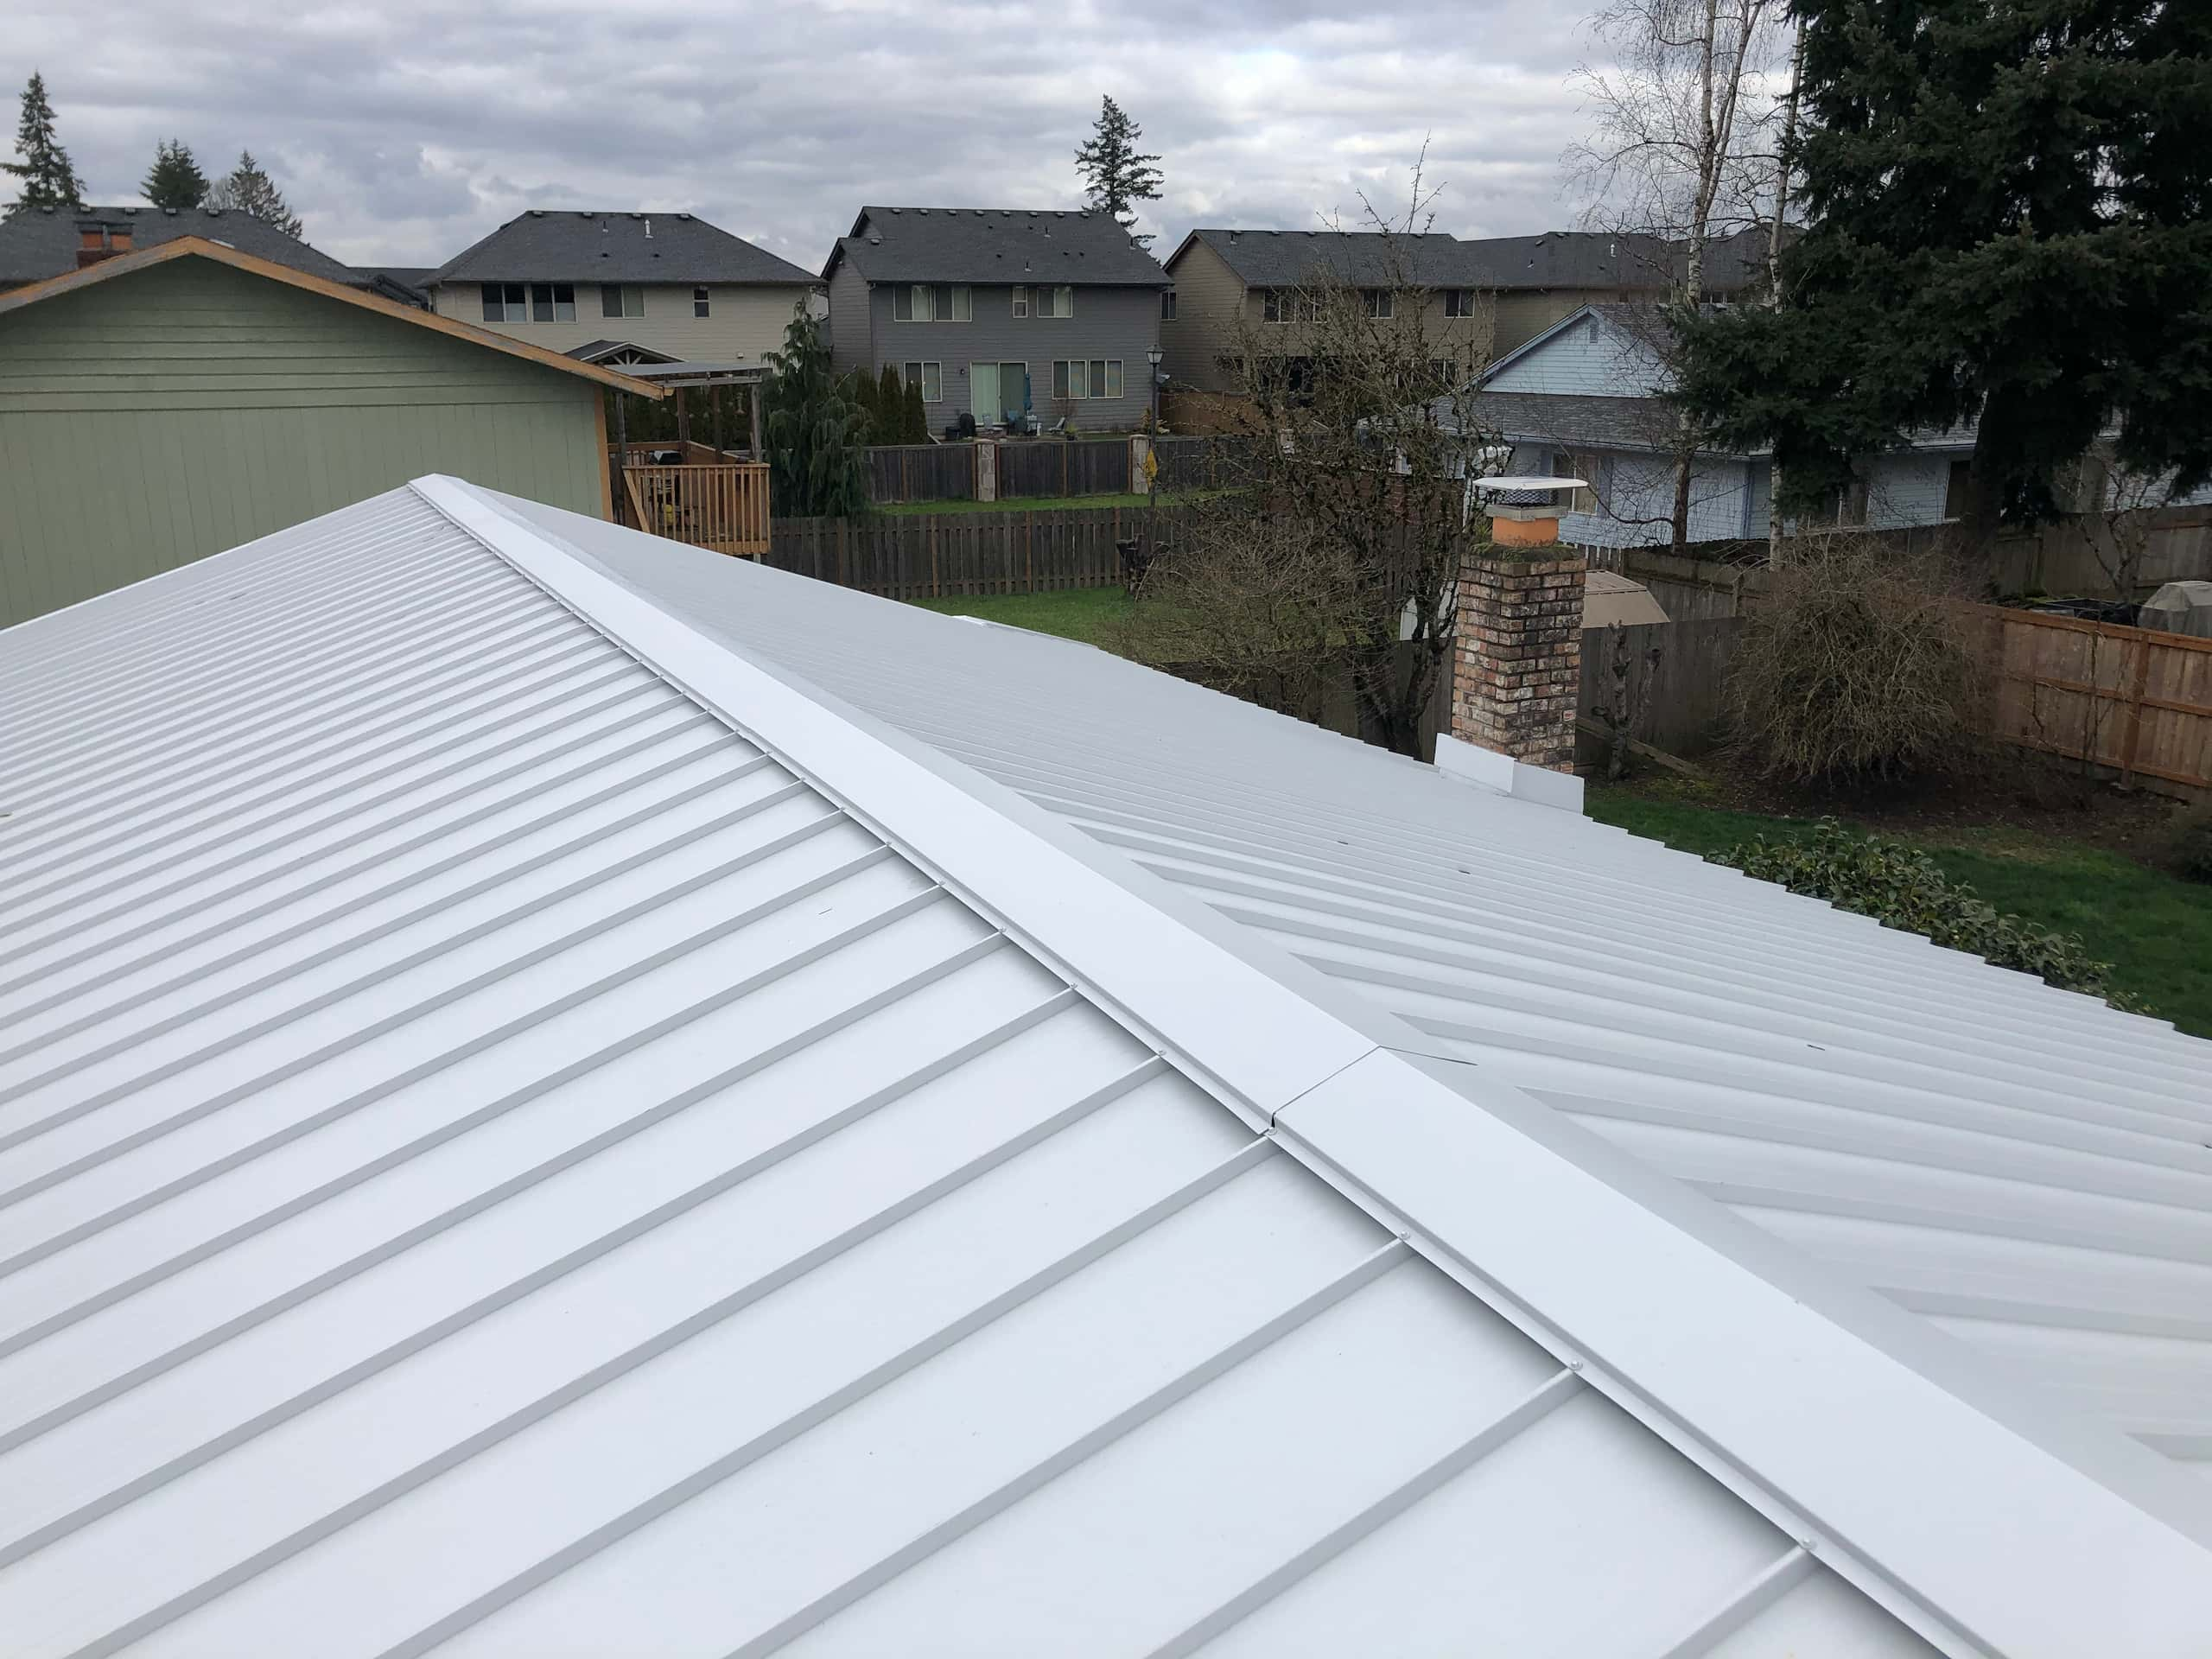 Reliance Roof Pros LLC | Beaverton | New Roof | Taylor Metal 24 Gauge Kynar | Glacier White | Ventilation Ridge